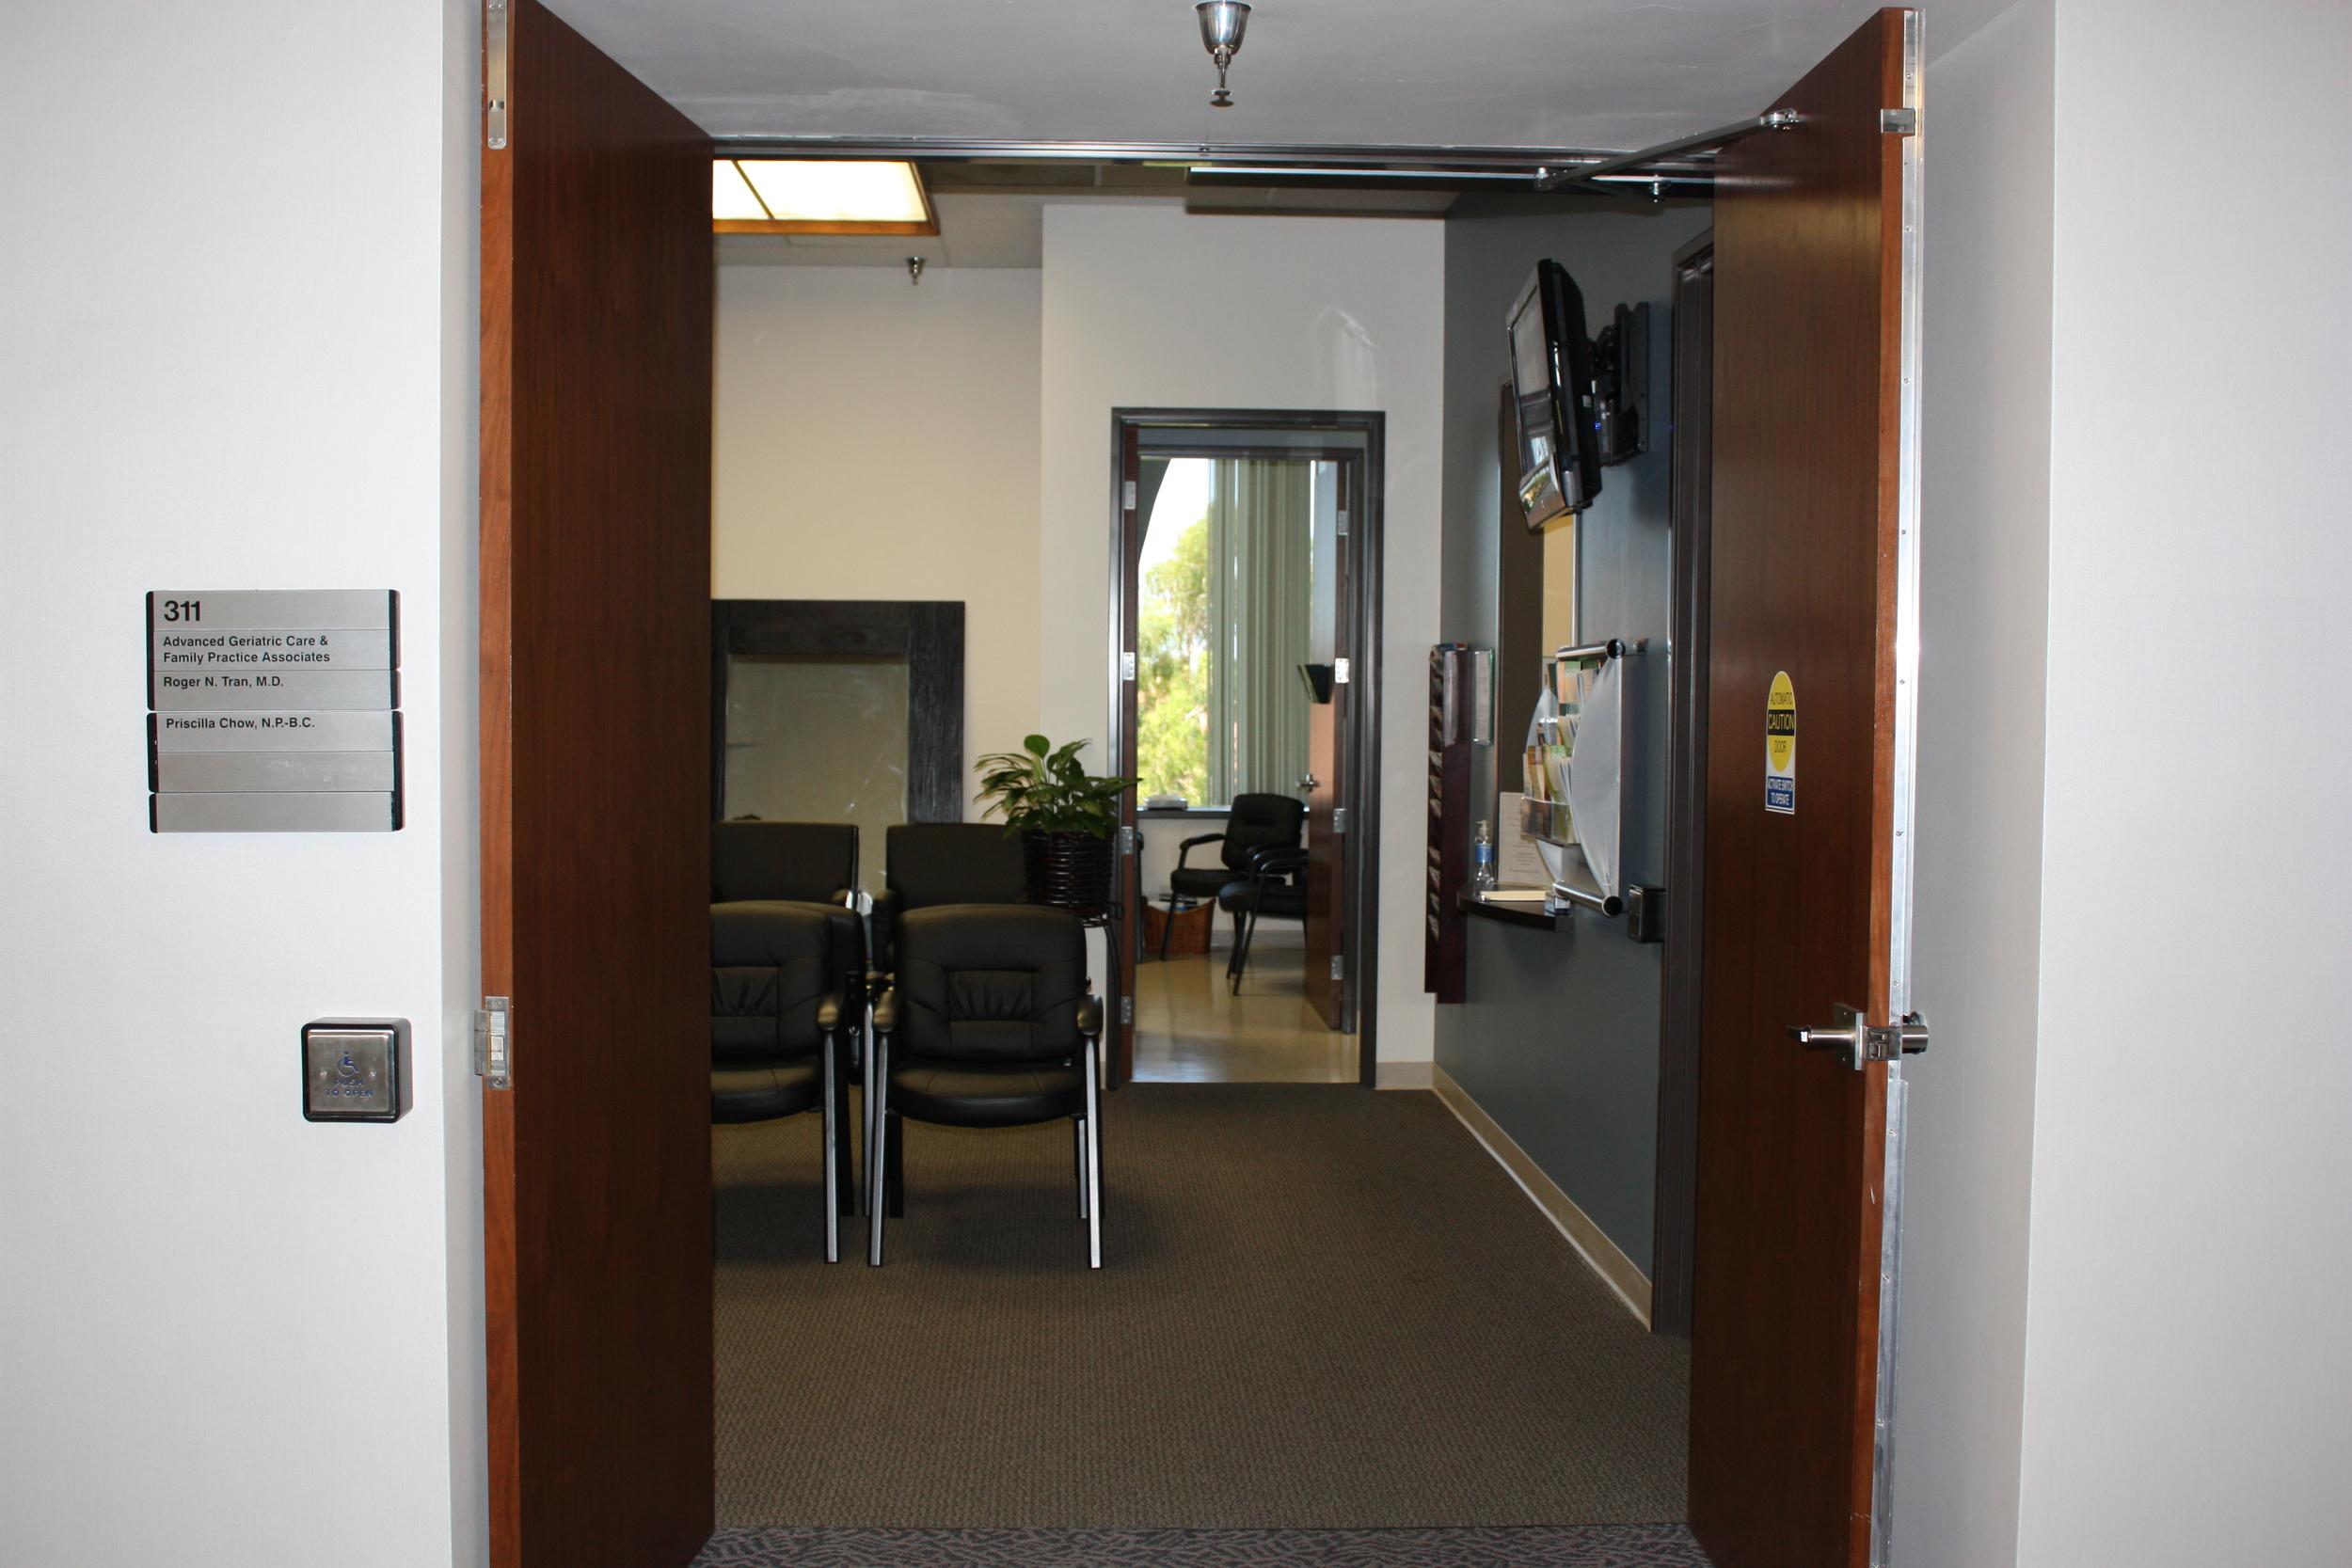 Image office entrance.jpg